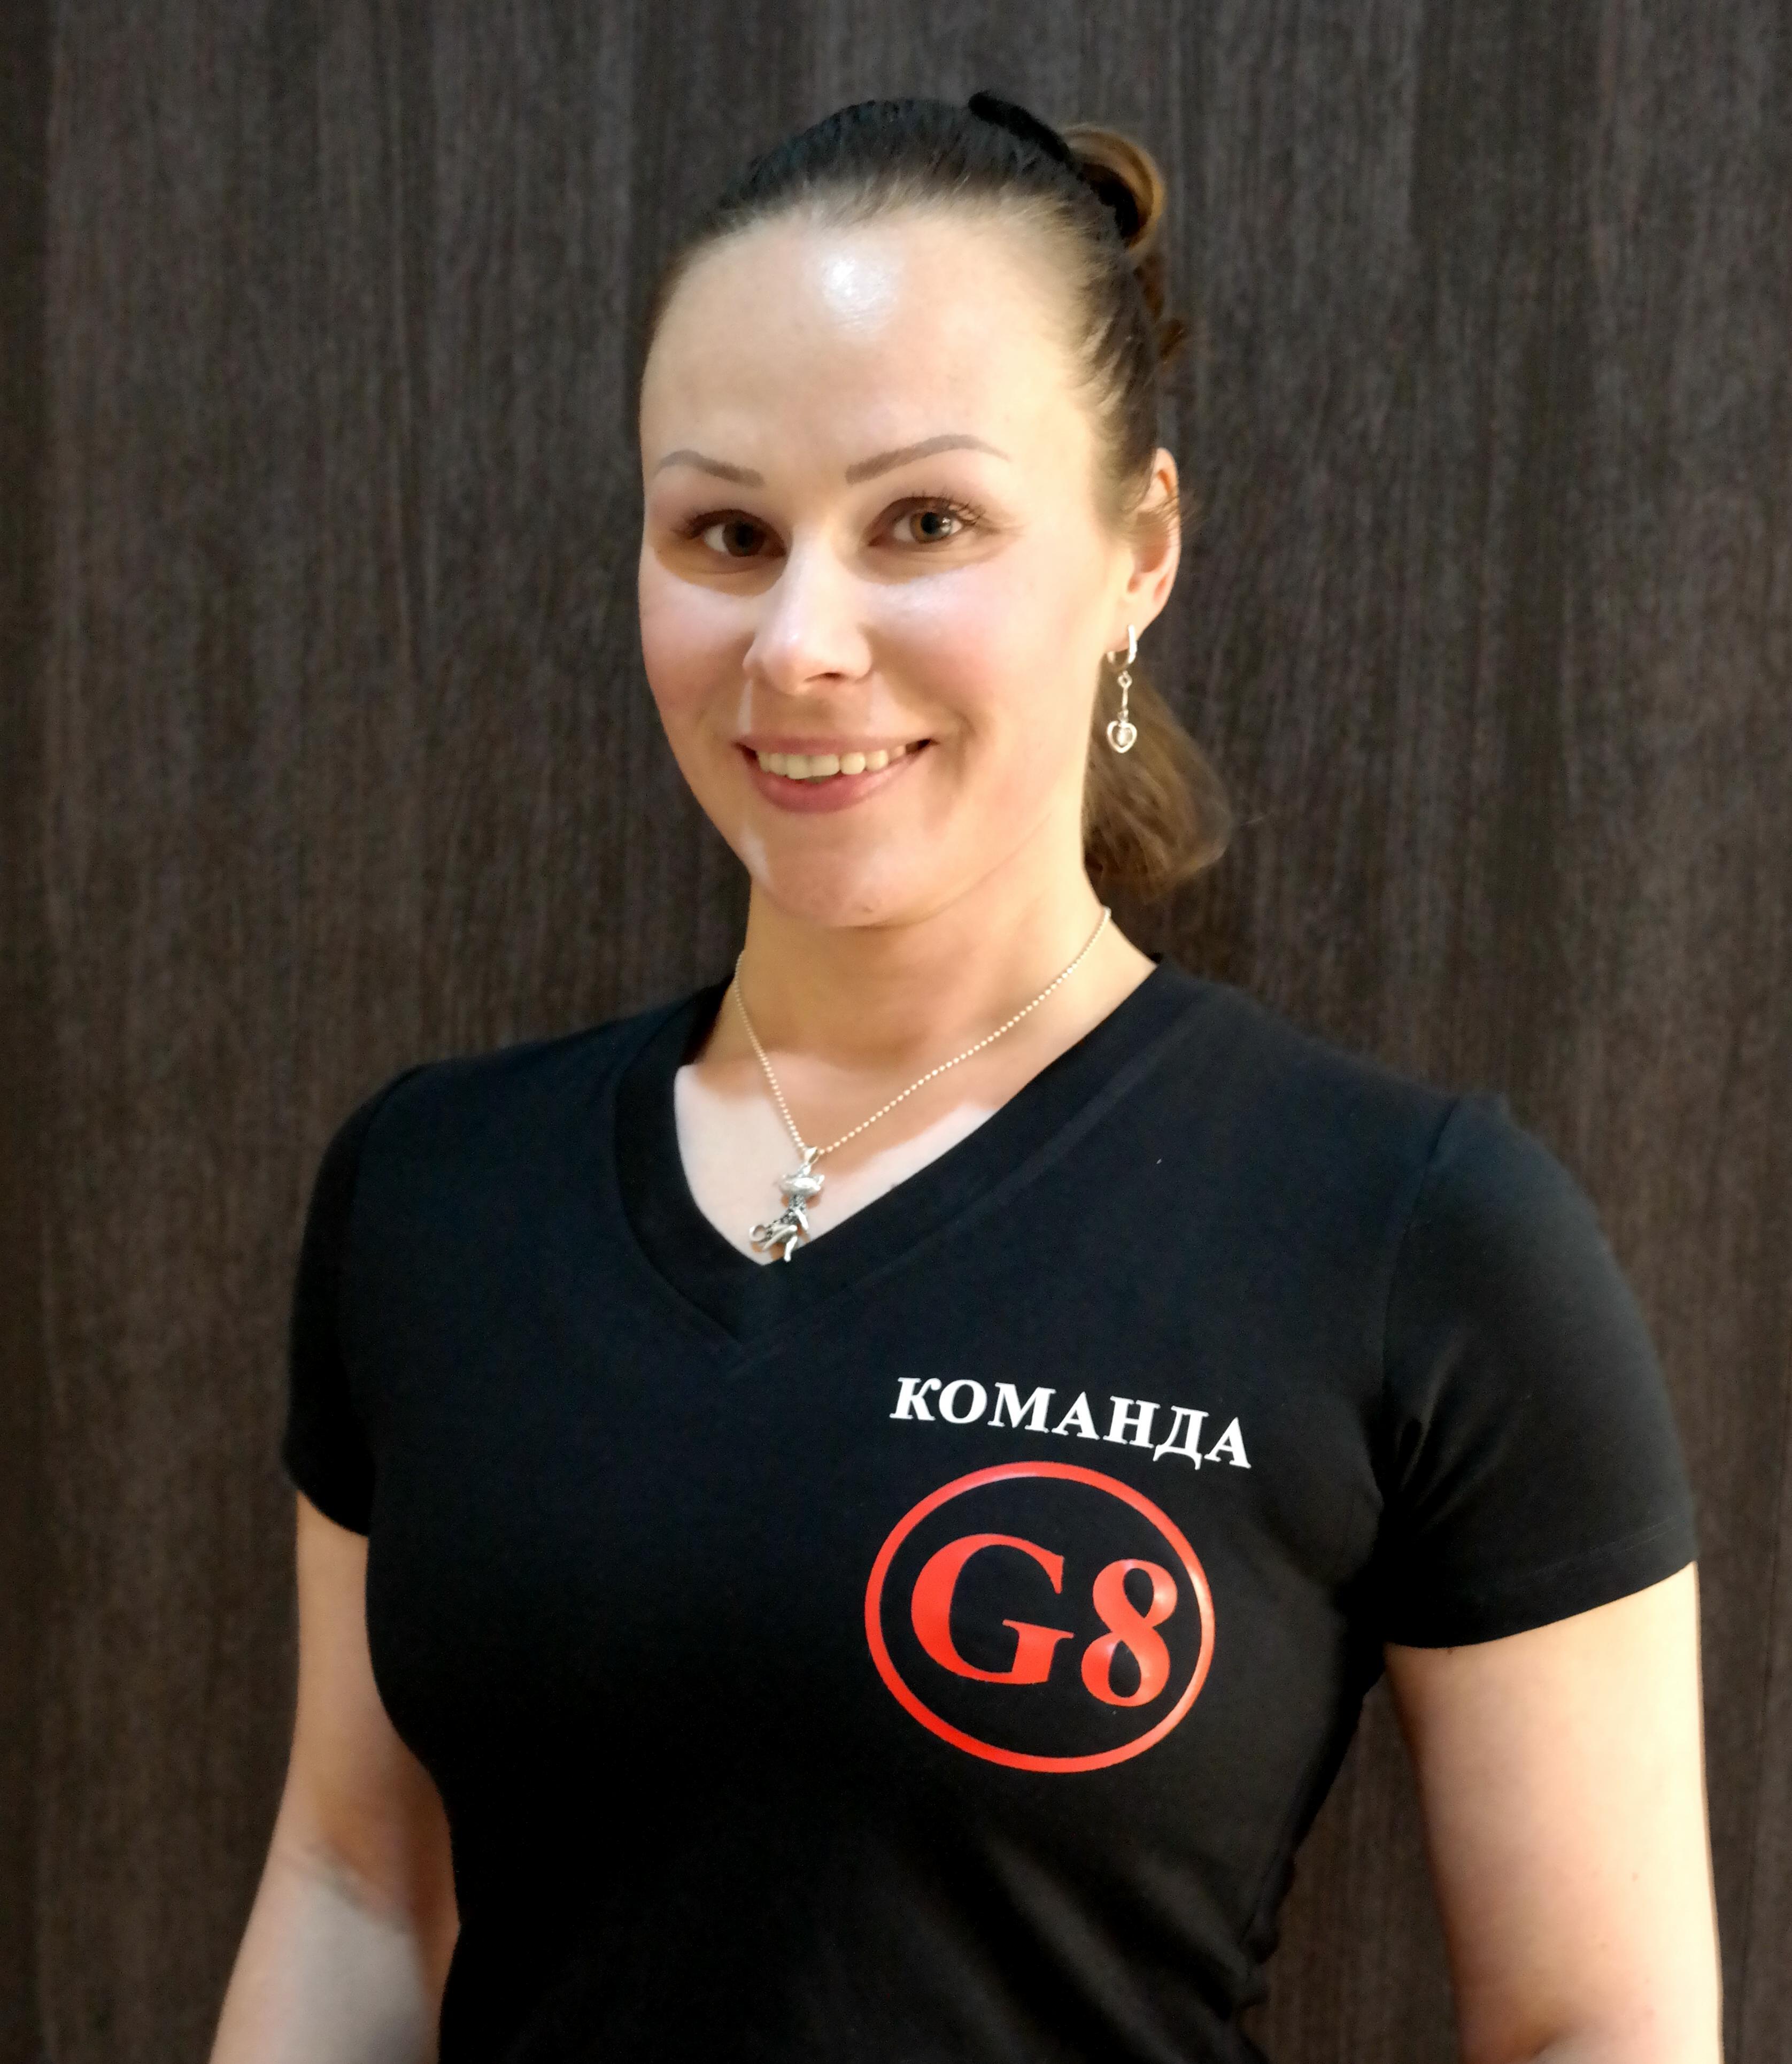 Команда G8: Юлия Петренко